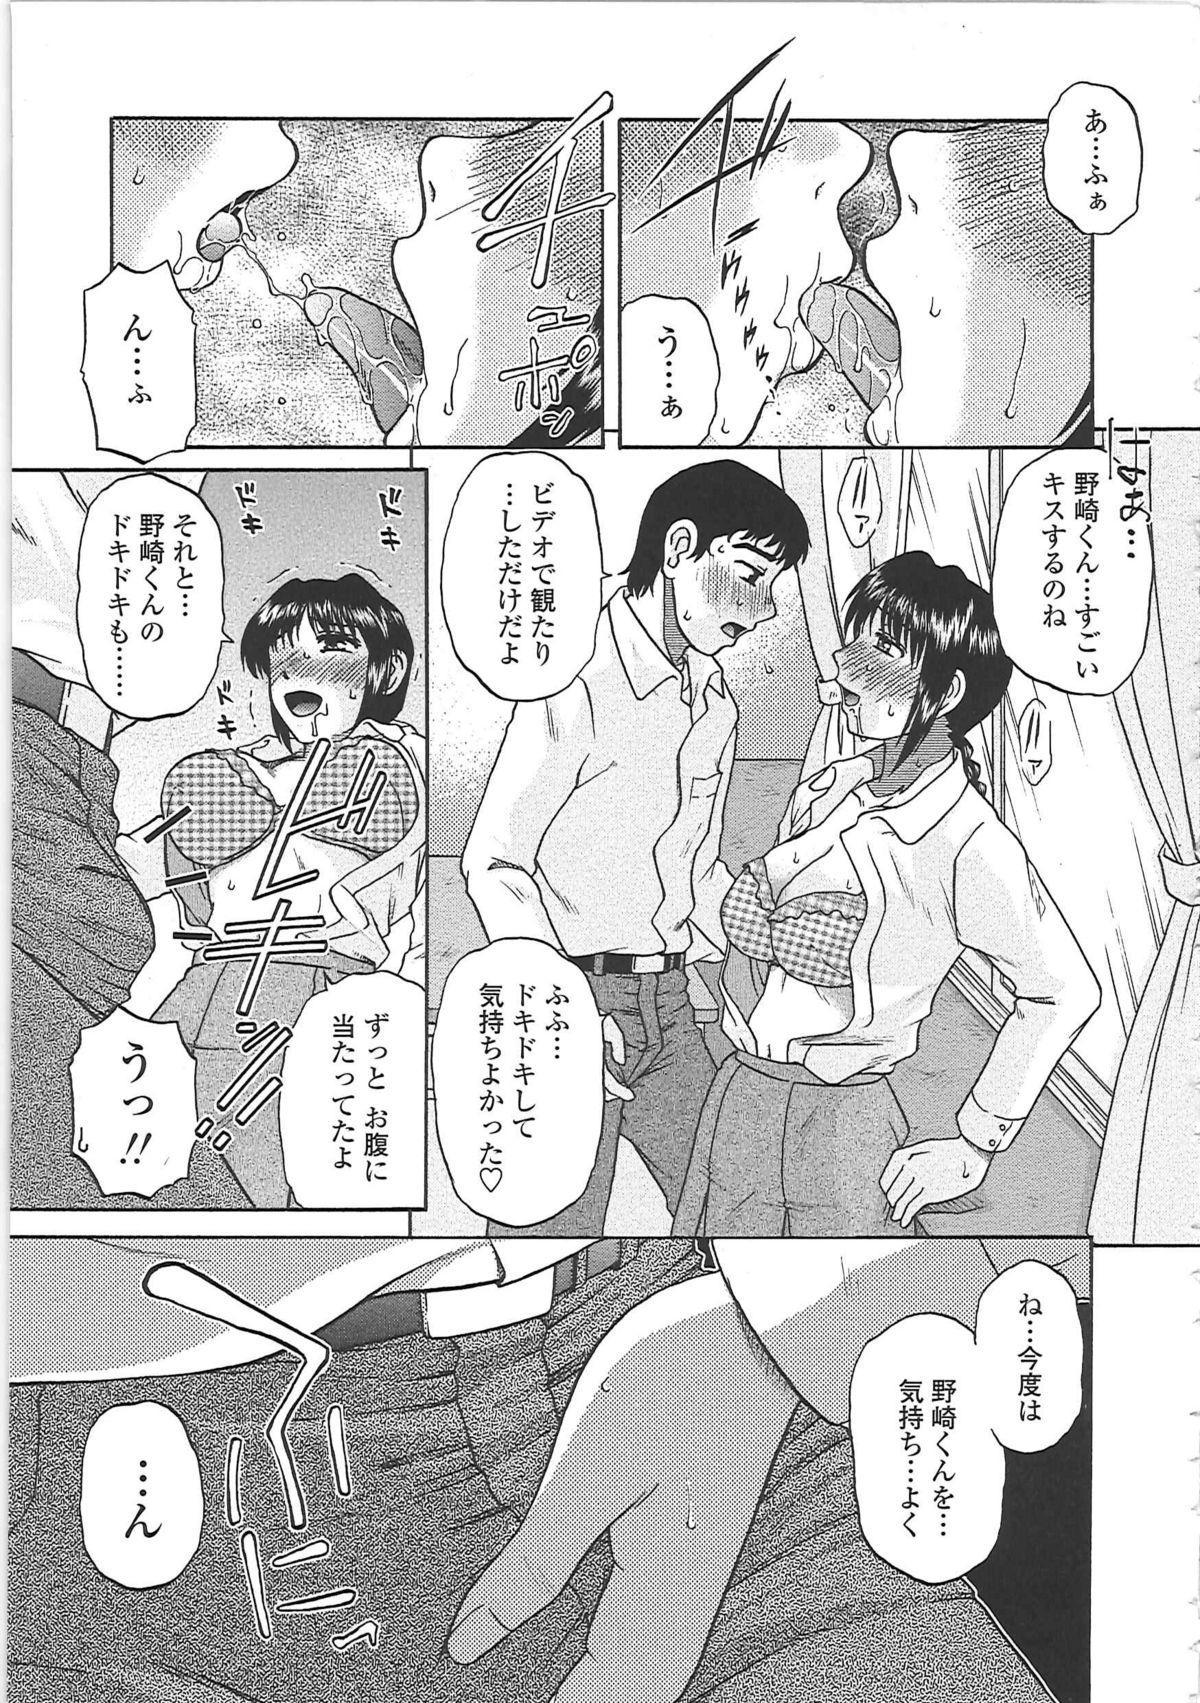 Nikuzuma Tsuushin - Erotic Wife Communication 69